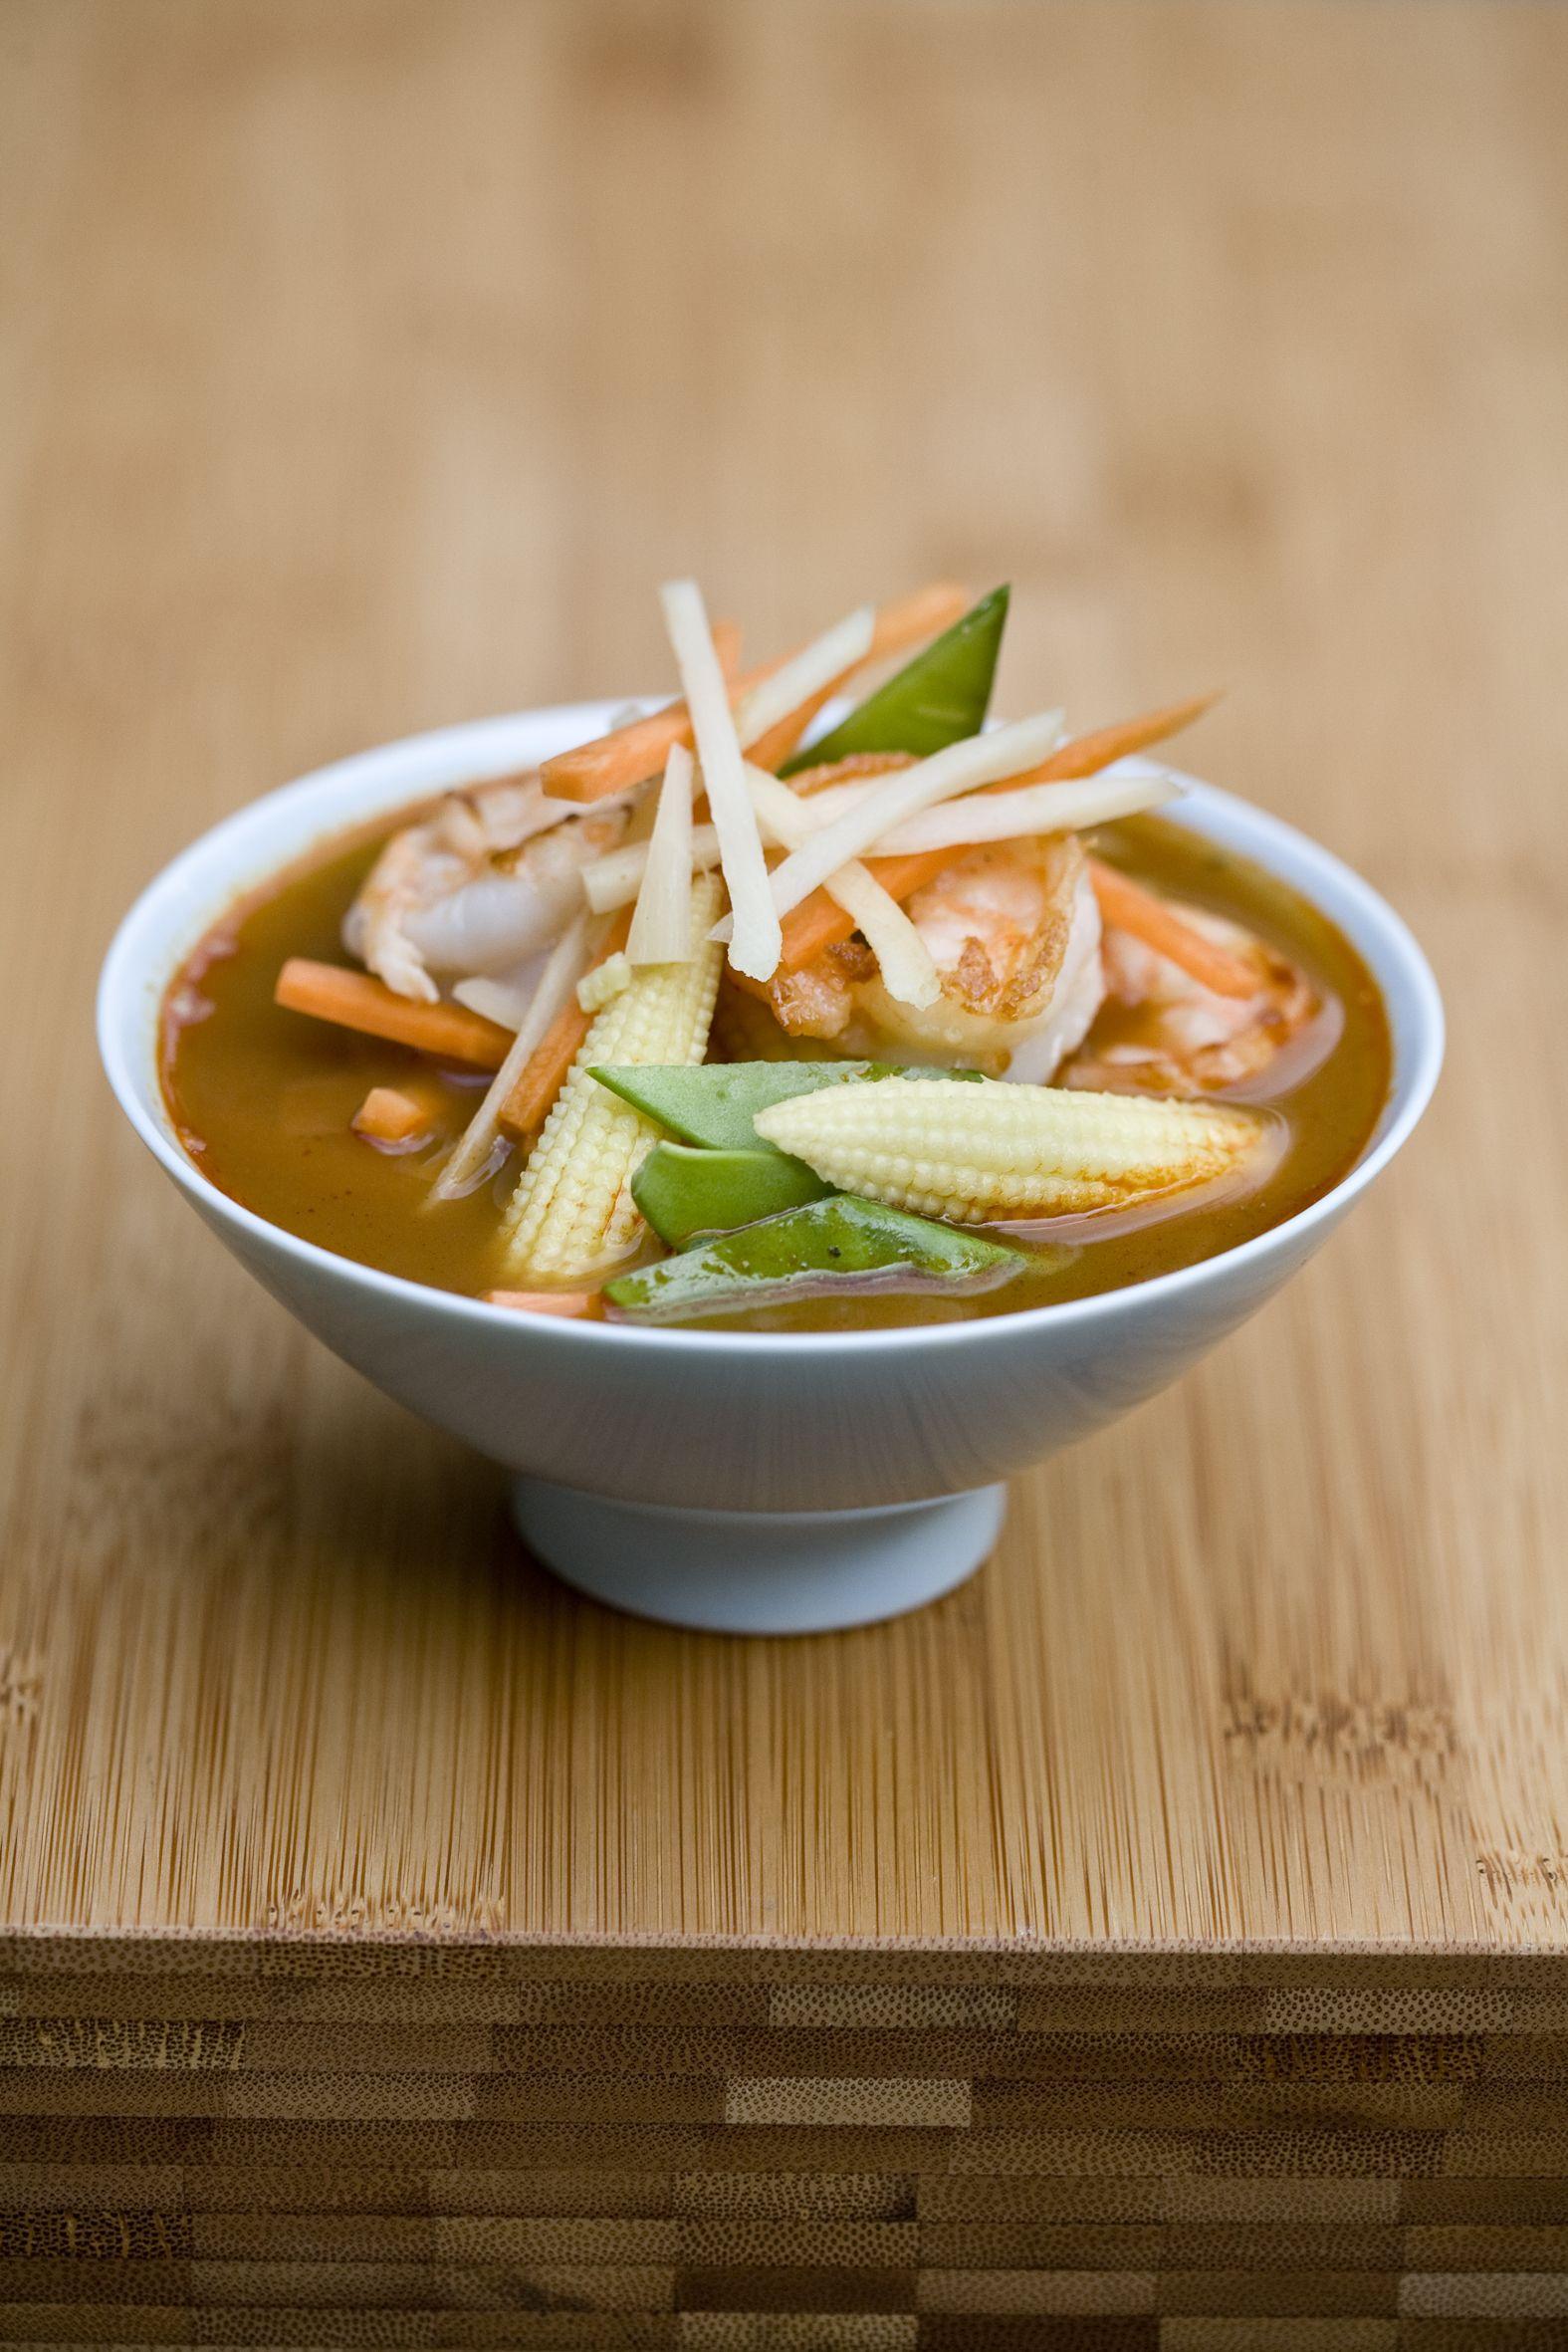 Karidesli Ananaslı Noodle Tarifi – Yemek Tarifleri – Yemek Tarifleri